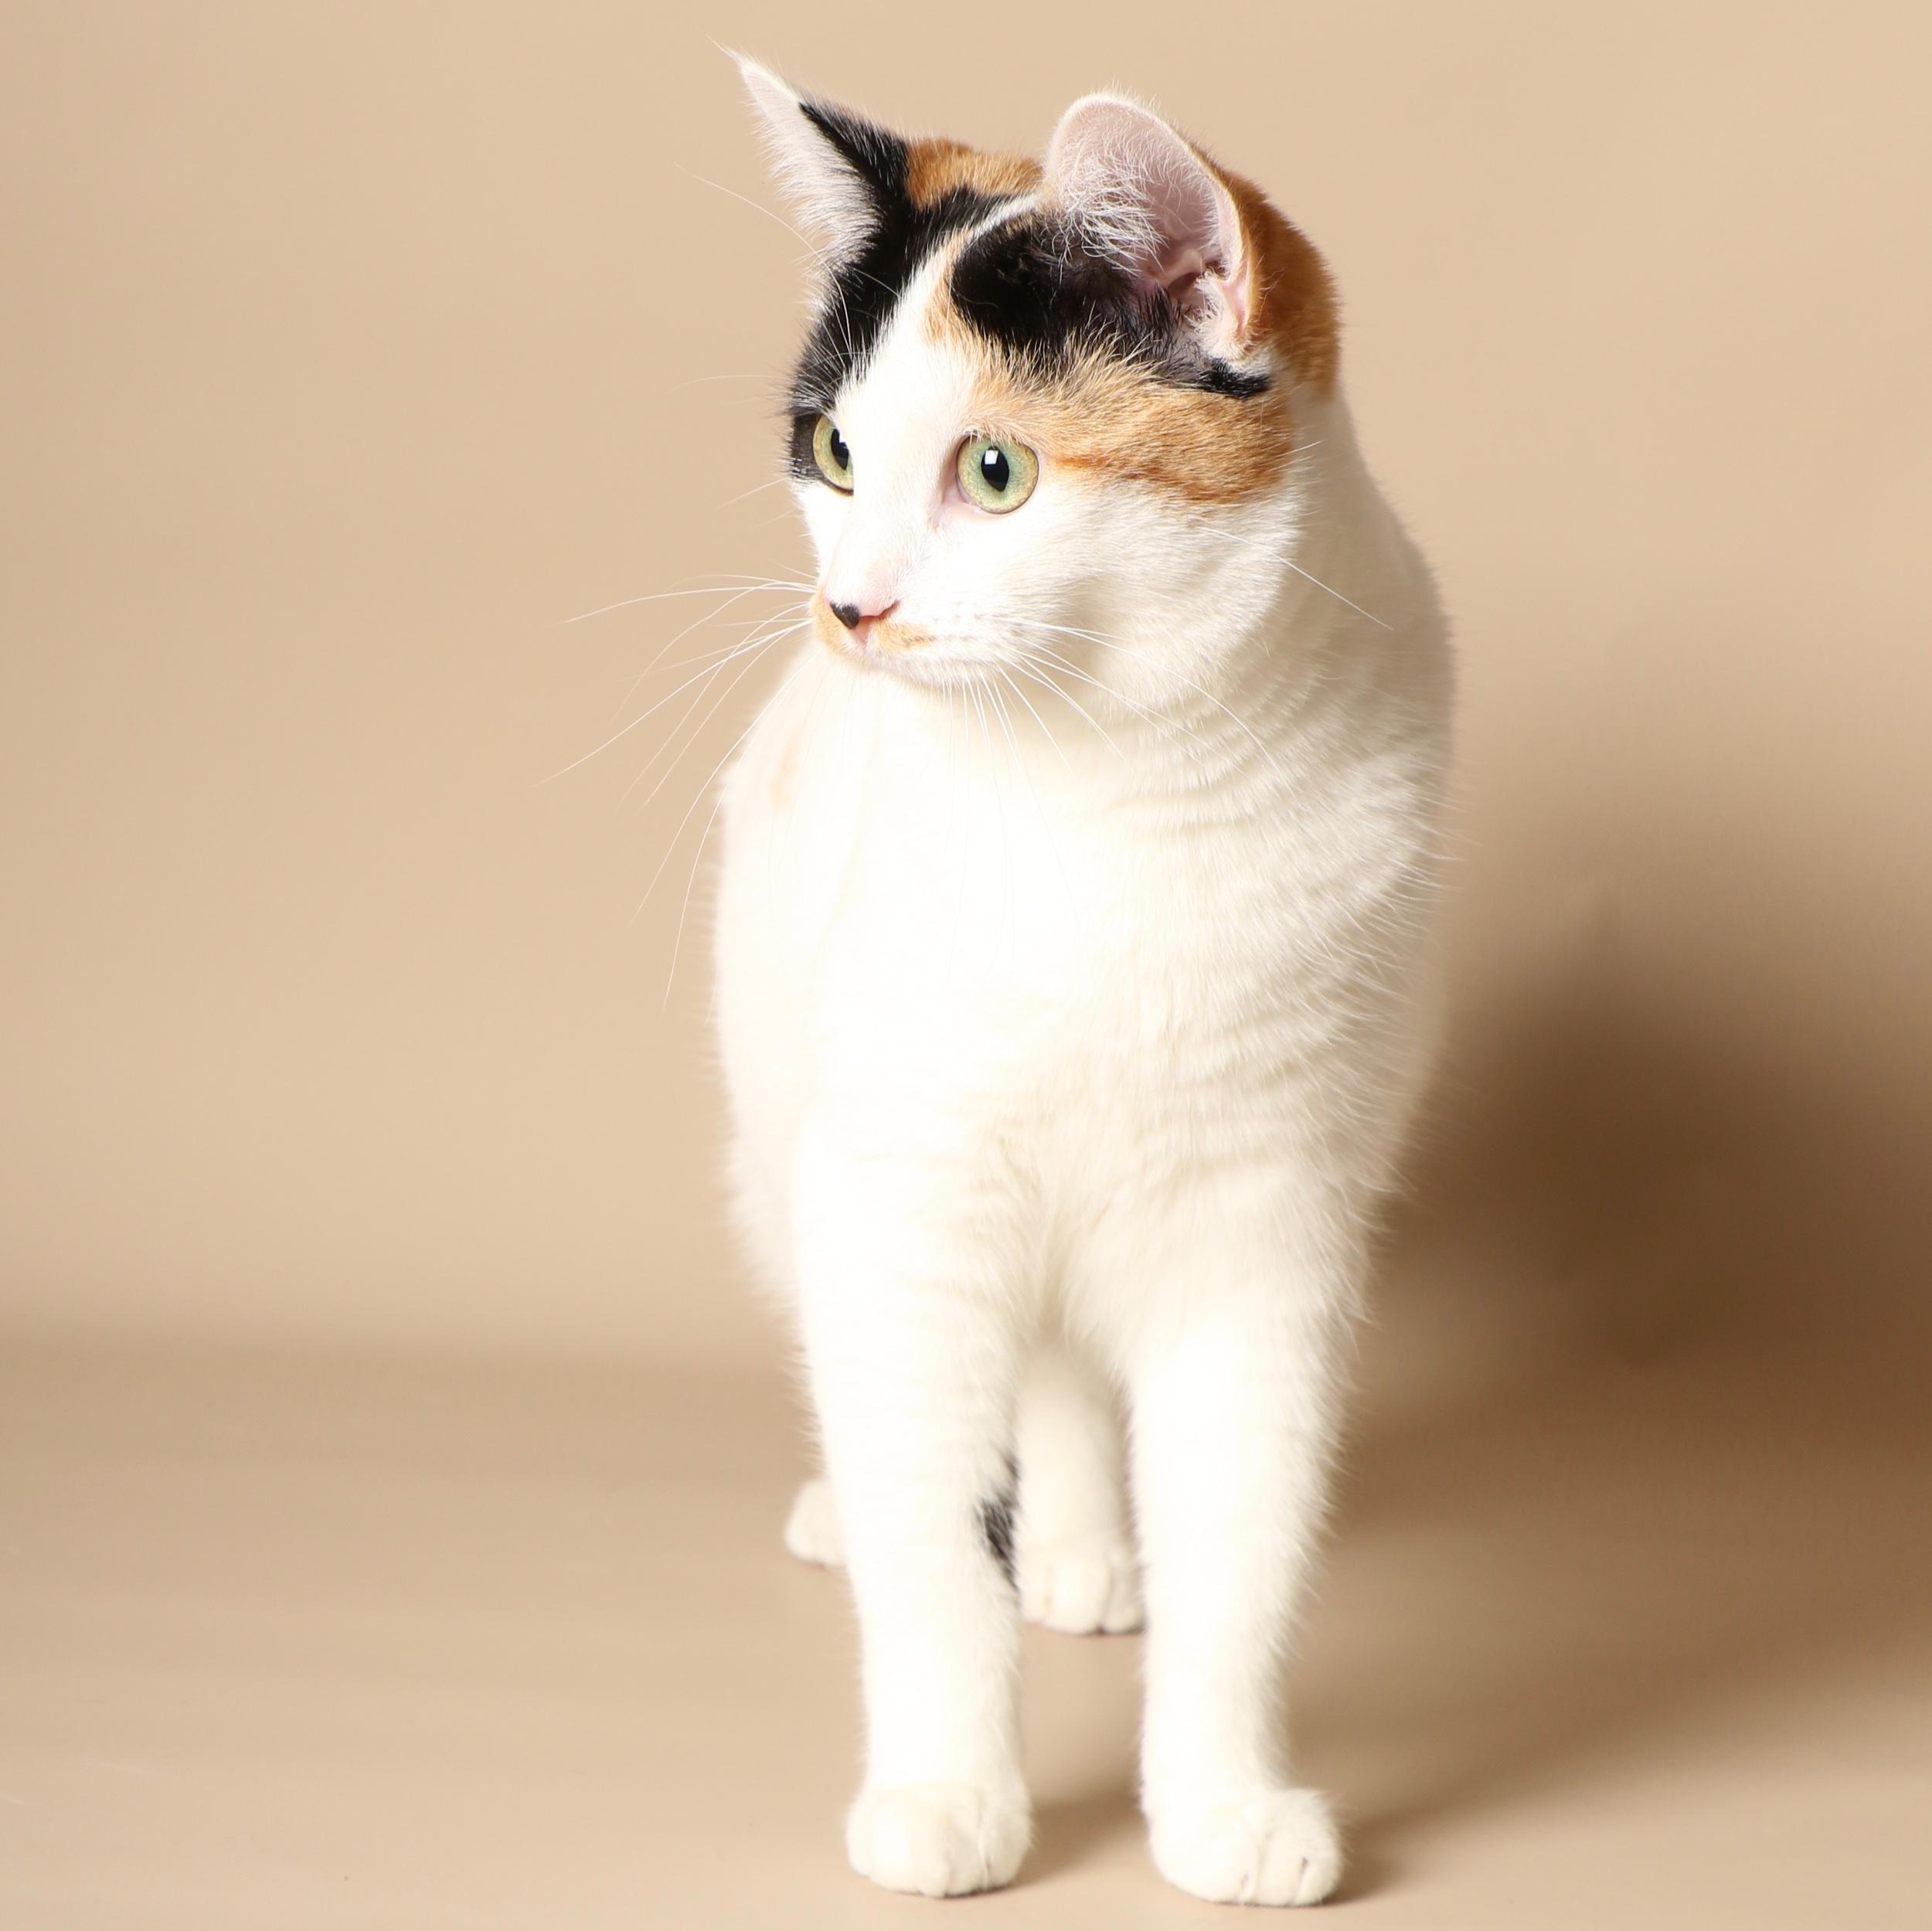 0960cats.jpeg